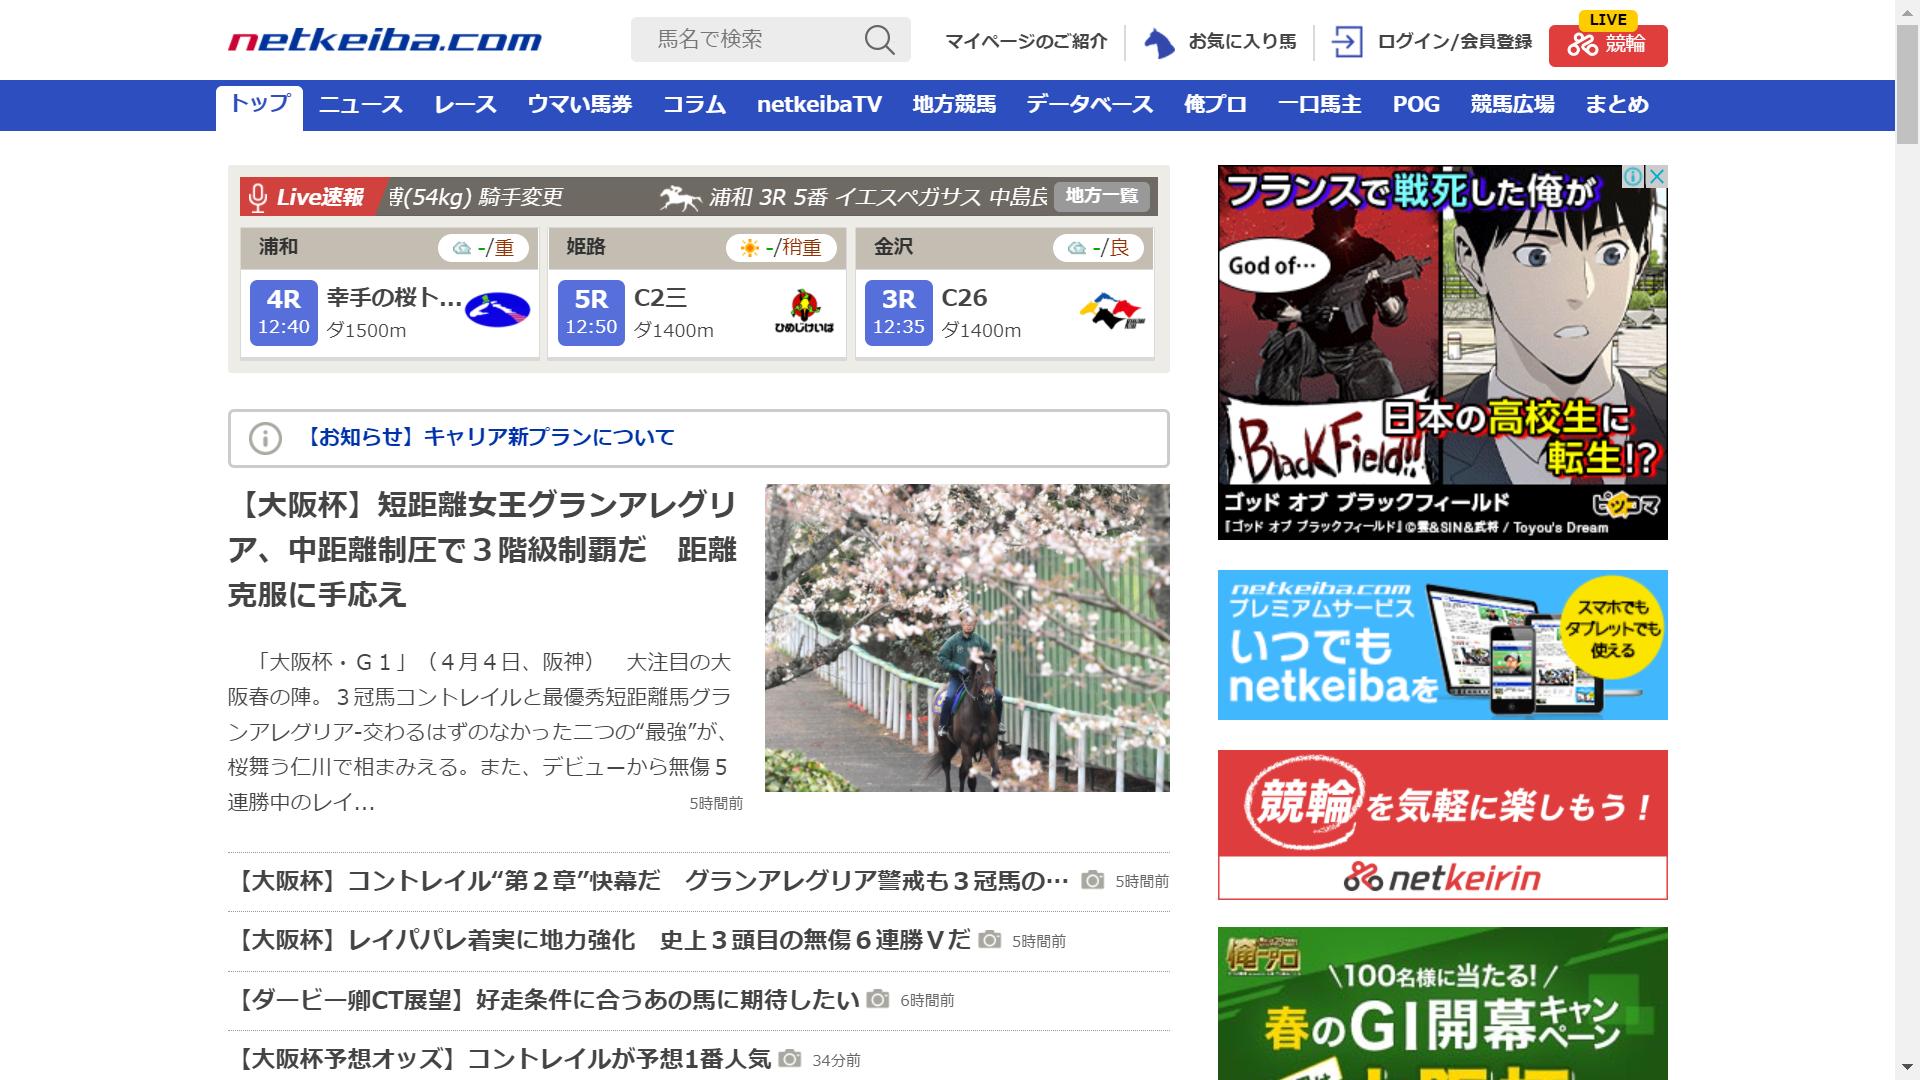 netkeiba.comの口コミ・評判・評価